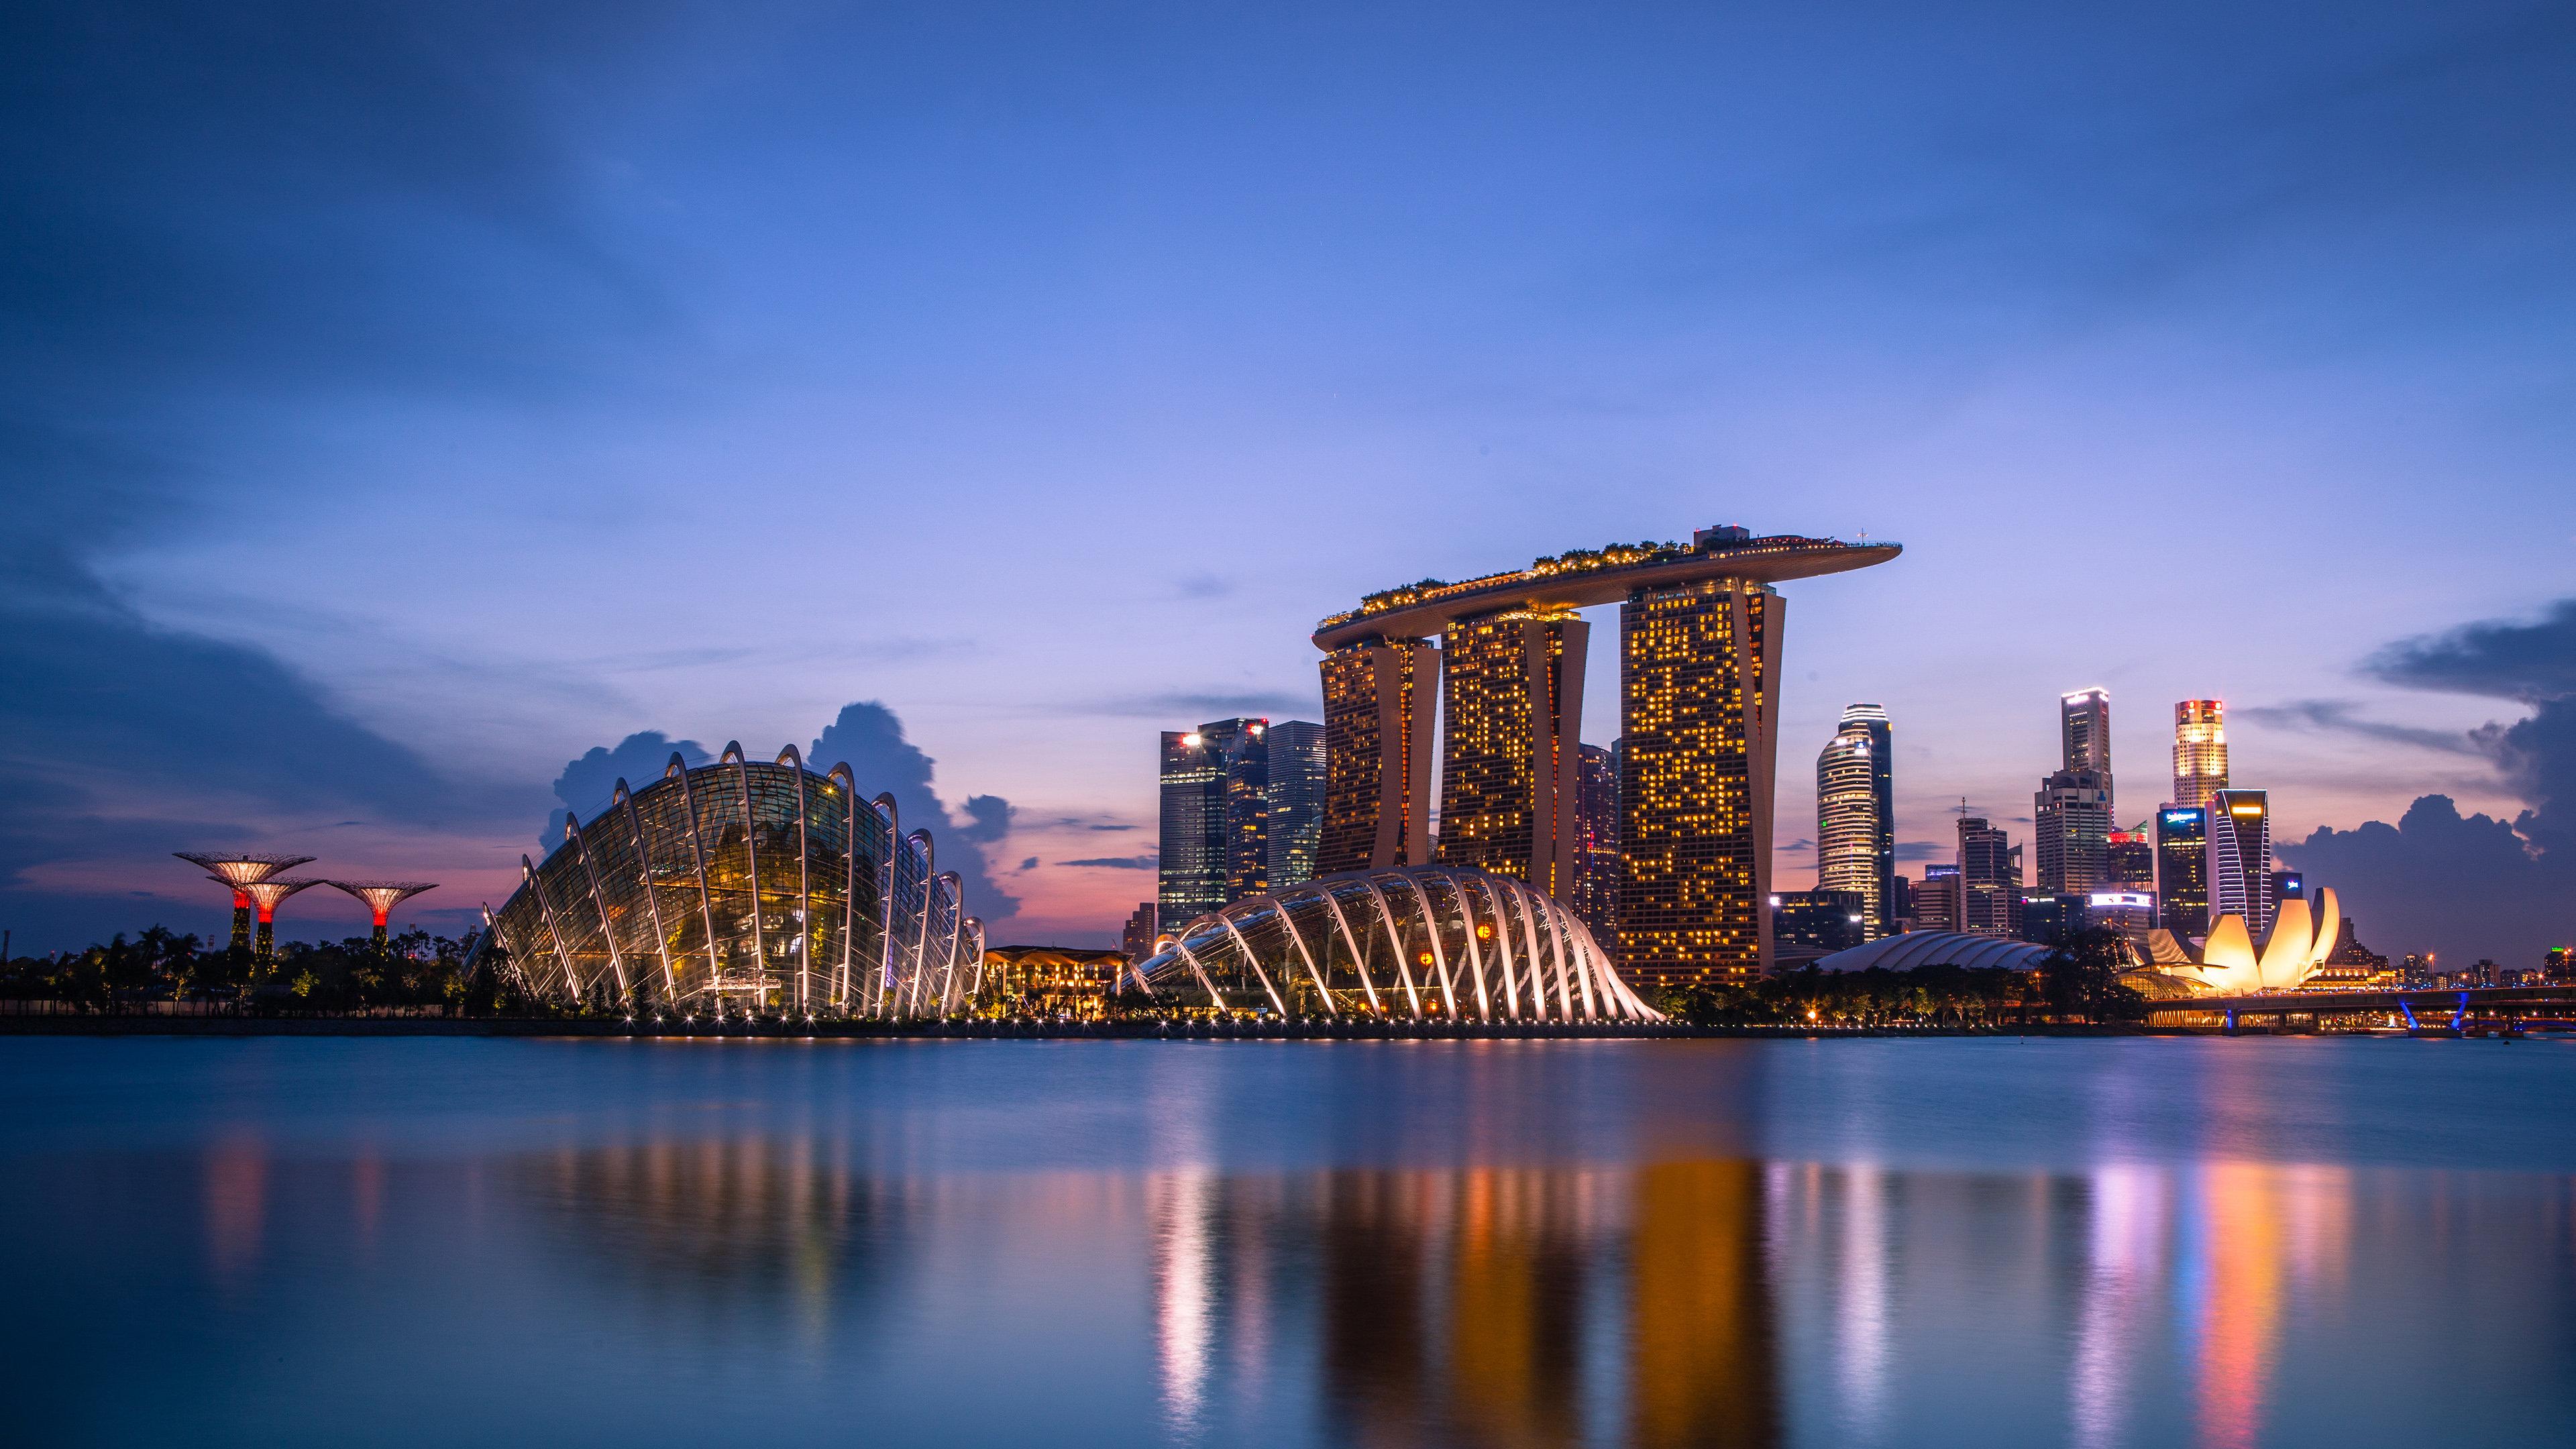 Marina Bay Sands 4k Wallpaper 3840x2160